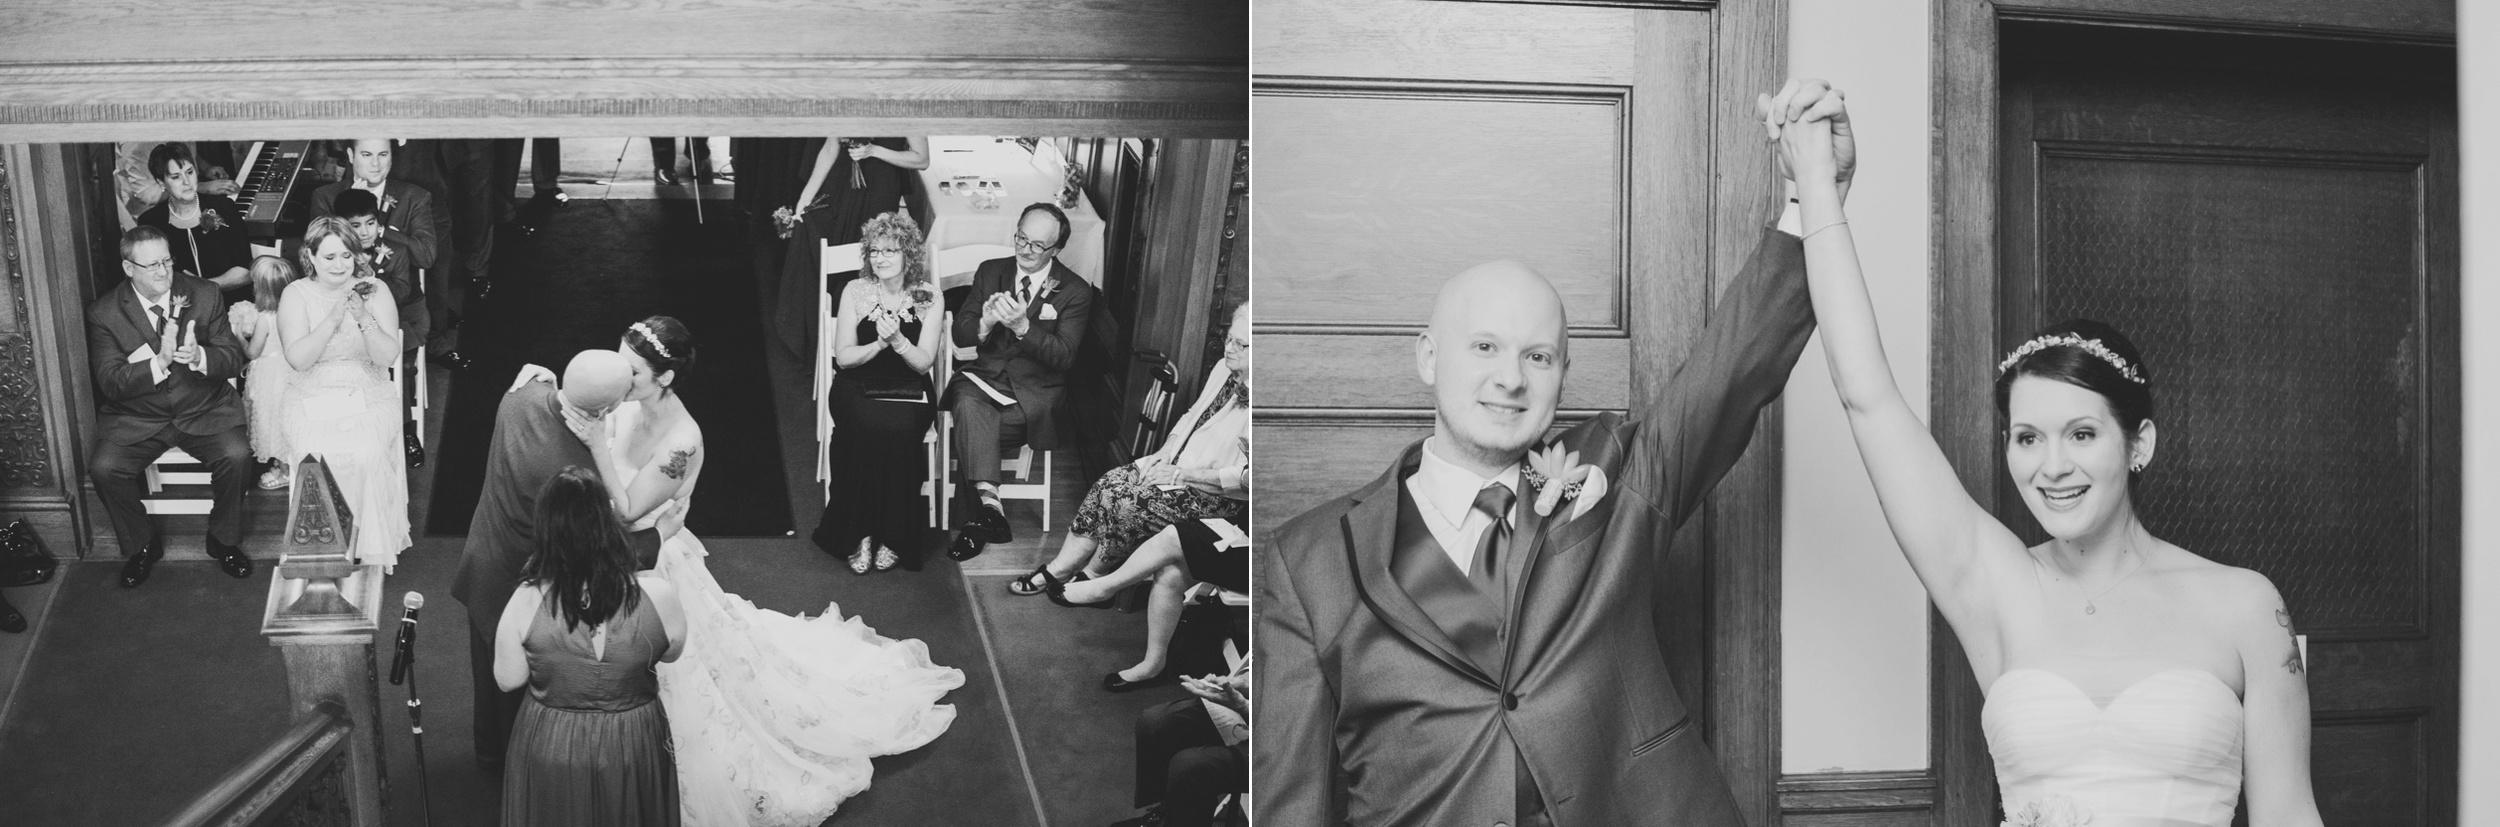 Glensheen Mansion Wedding | Duluth, MN Wedding Photographer_0510.jpg